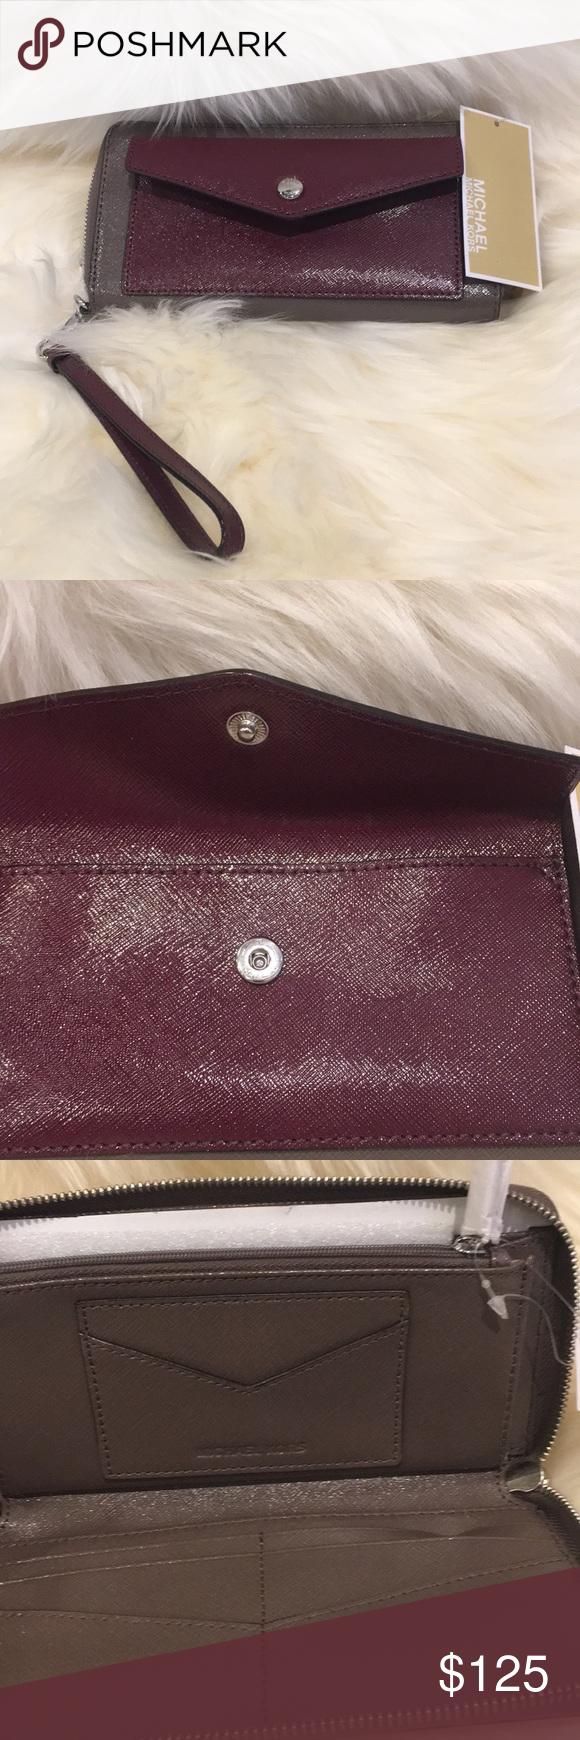 f55078cb0f0f ... ireland michael kors wallet michael kors honey travel continental large  zip around envelope saffiano leather c25bf